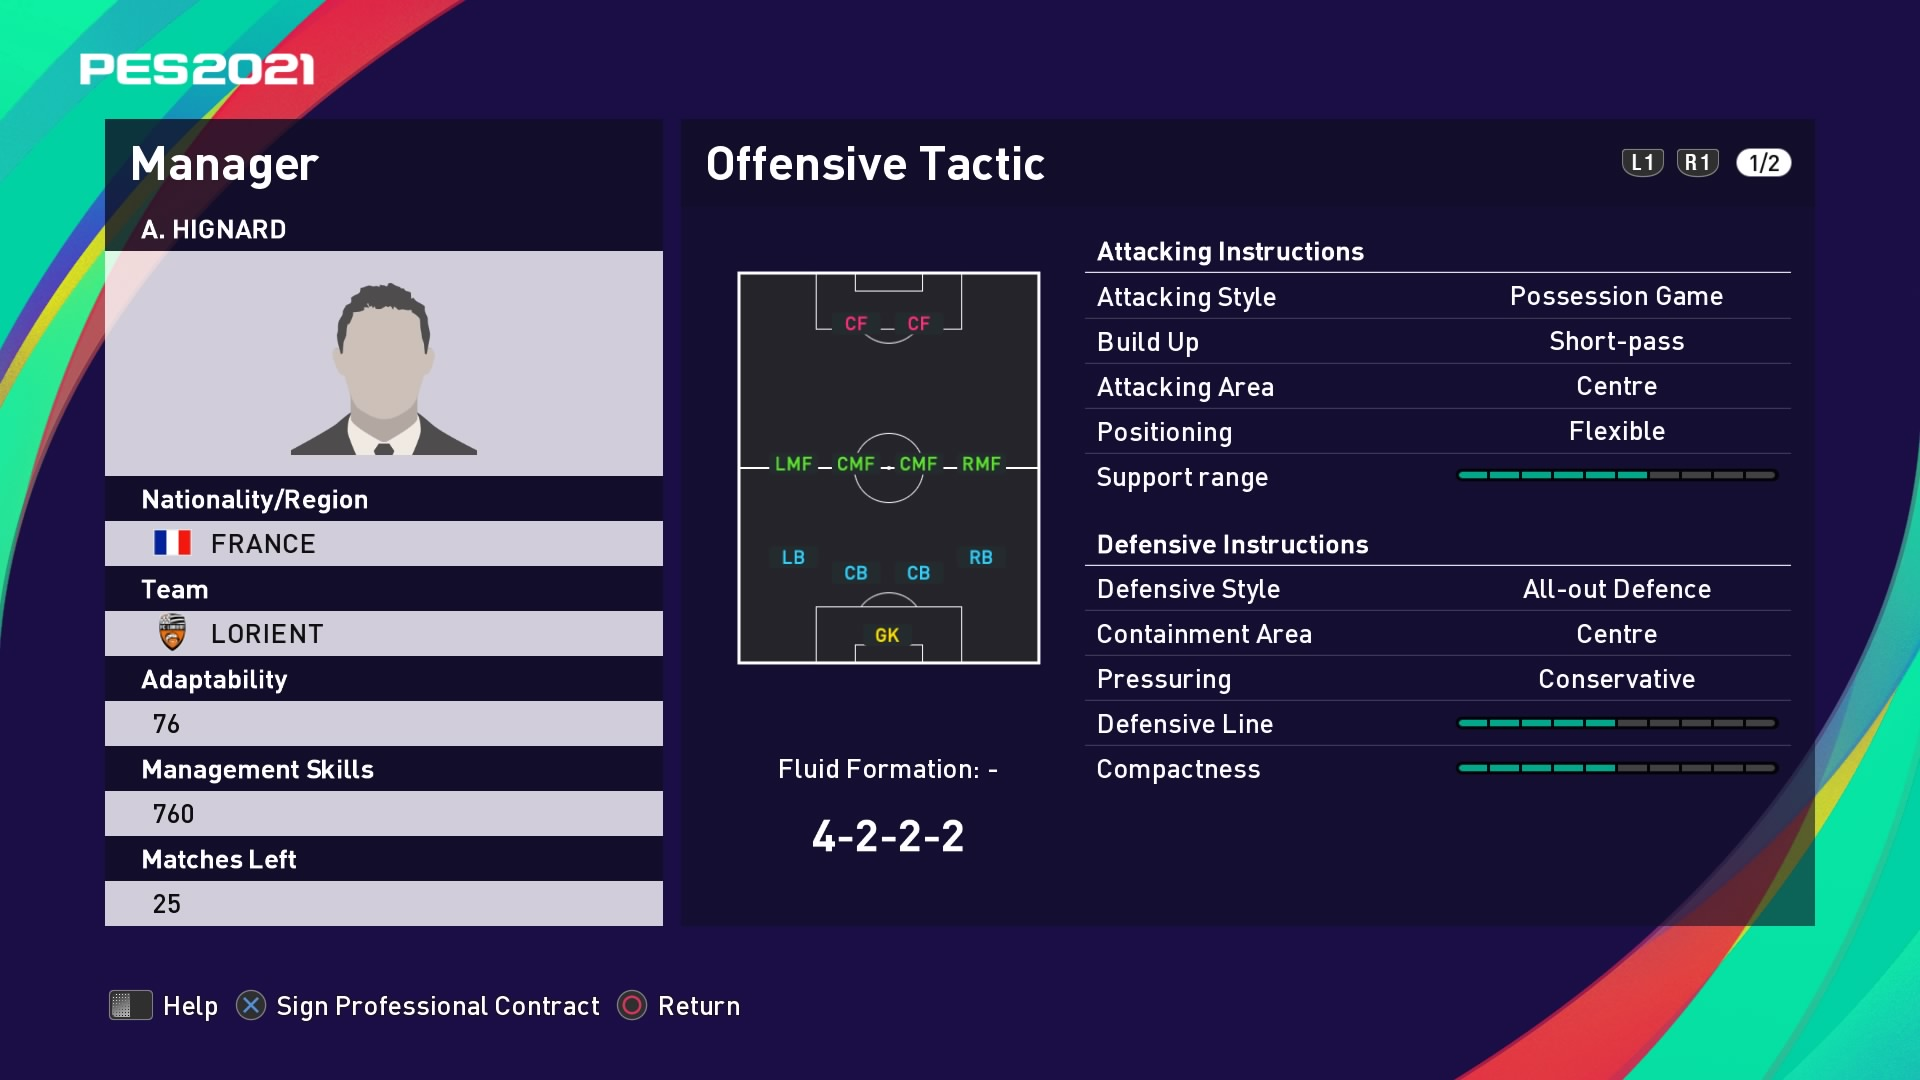 A. Hignard (2) (Christophe Pélissier) Offensive Tactic in PES 2021 myClub